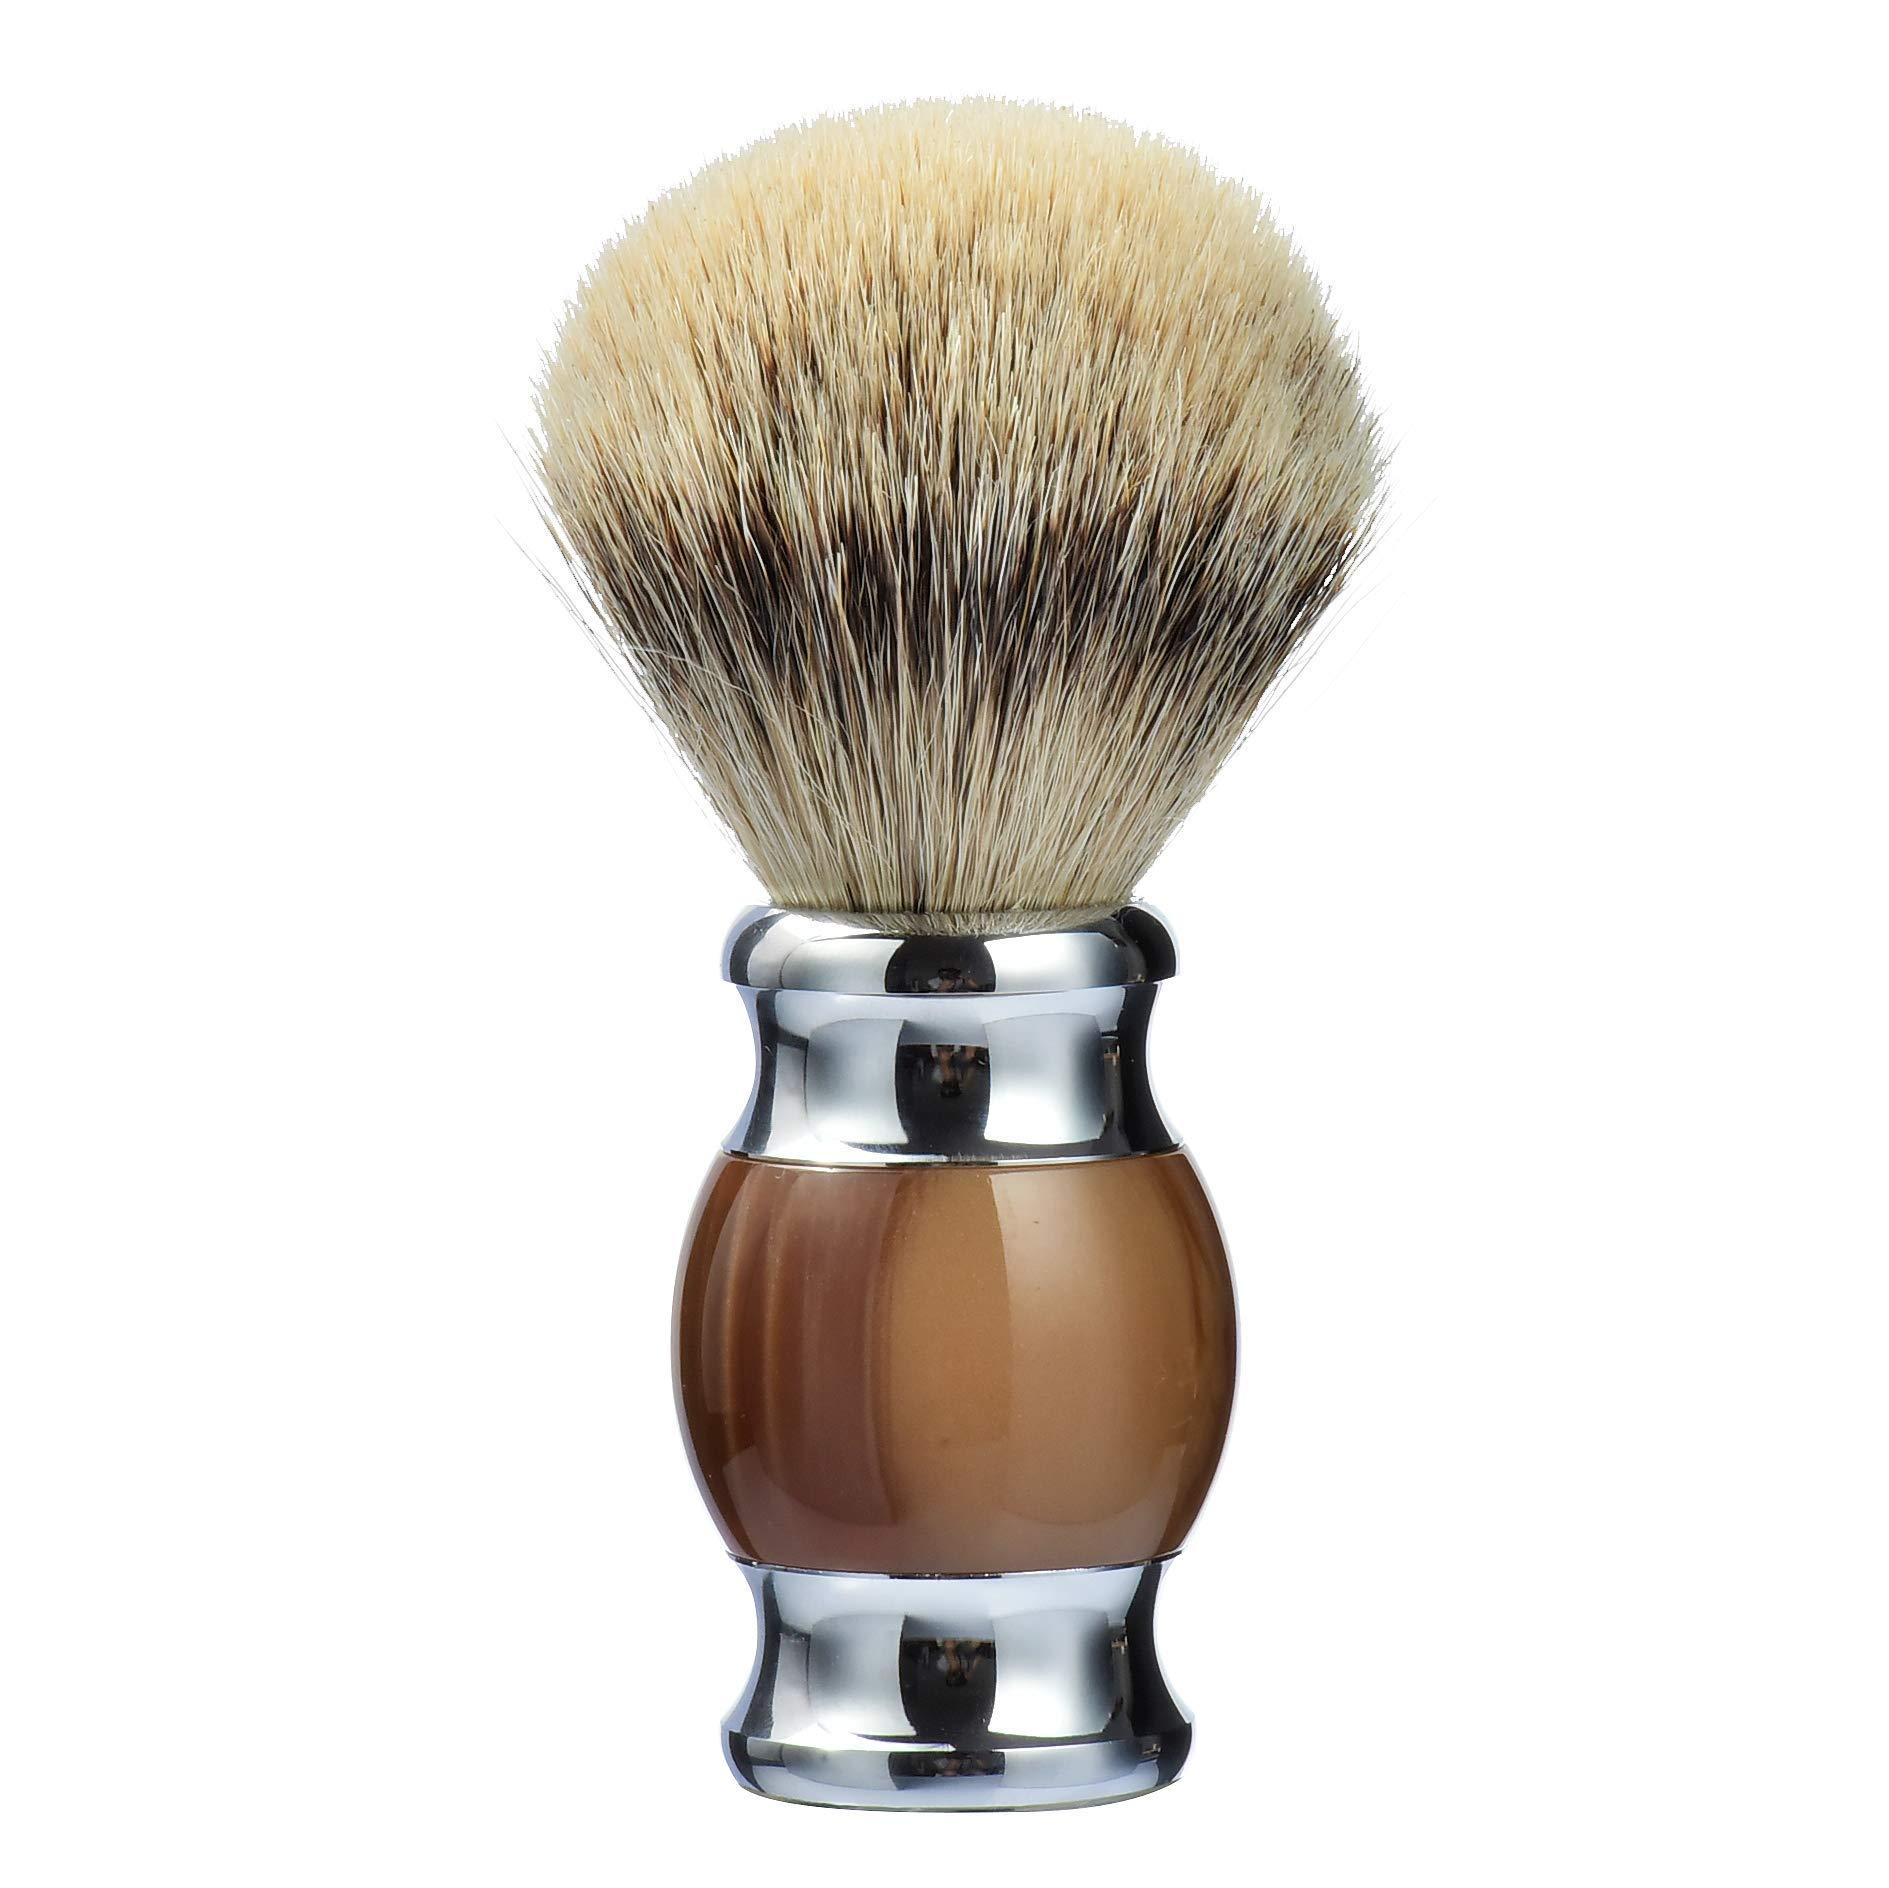 Je&Co 100% Silvertip Badger Hair Shaving Brush, Handmade Shaving Brush with Fine Resin Handle and Stainless Steel Base(brown) by Je&Co